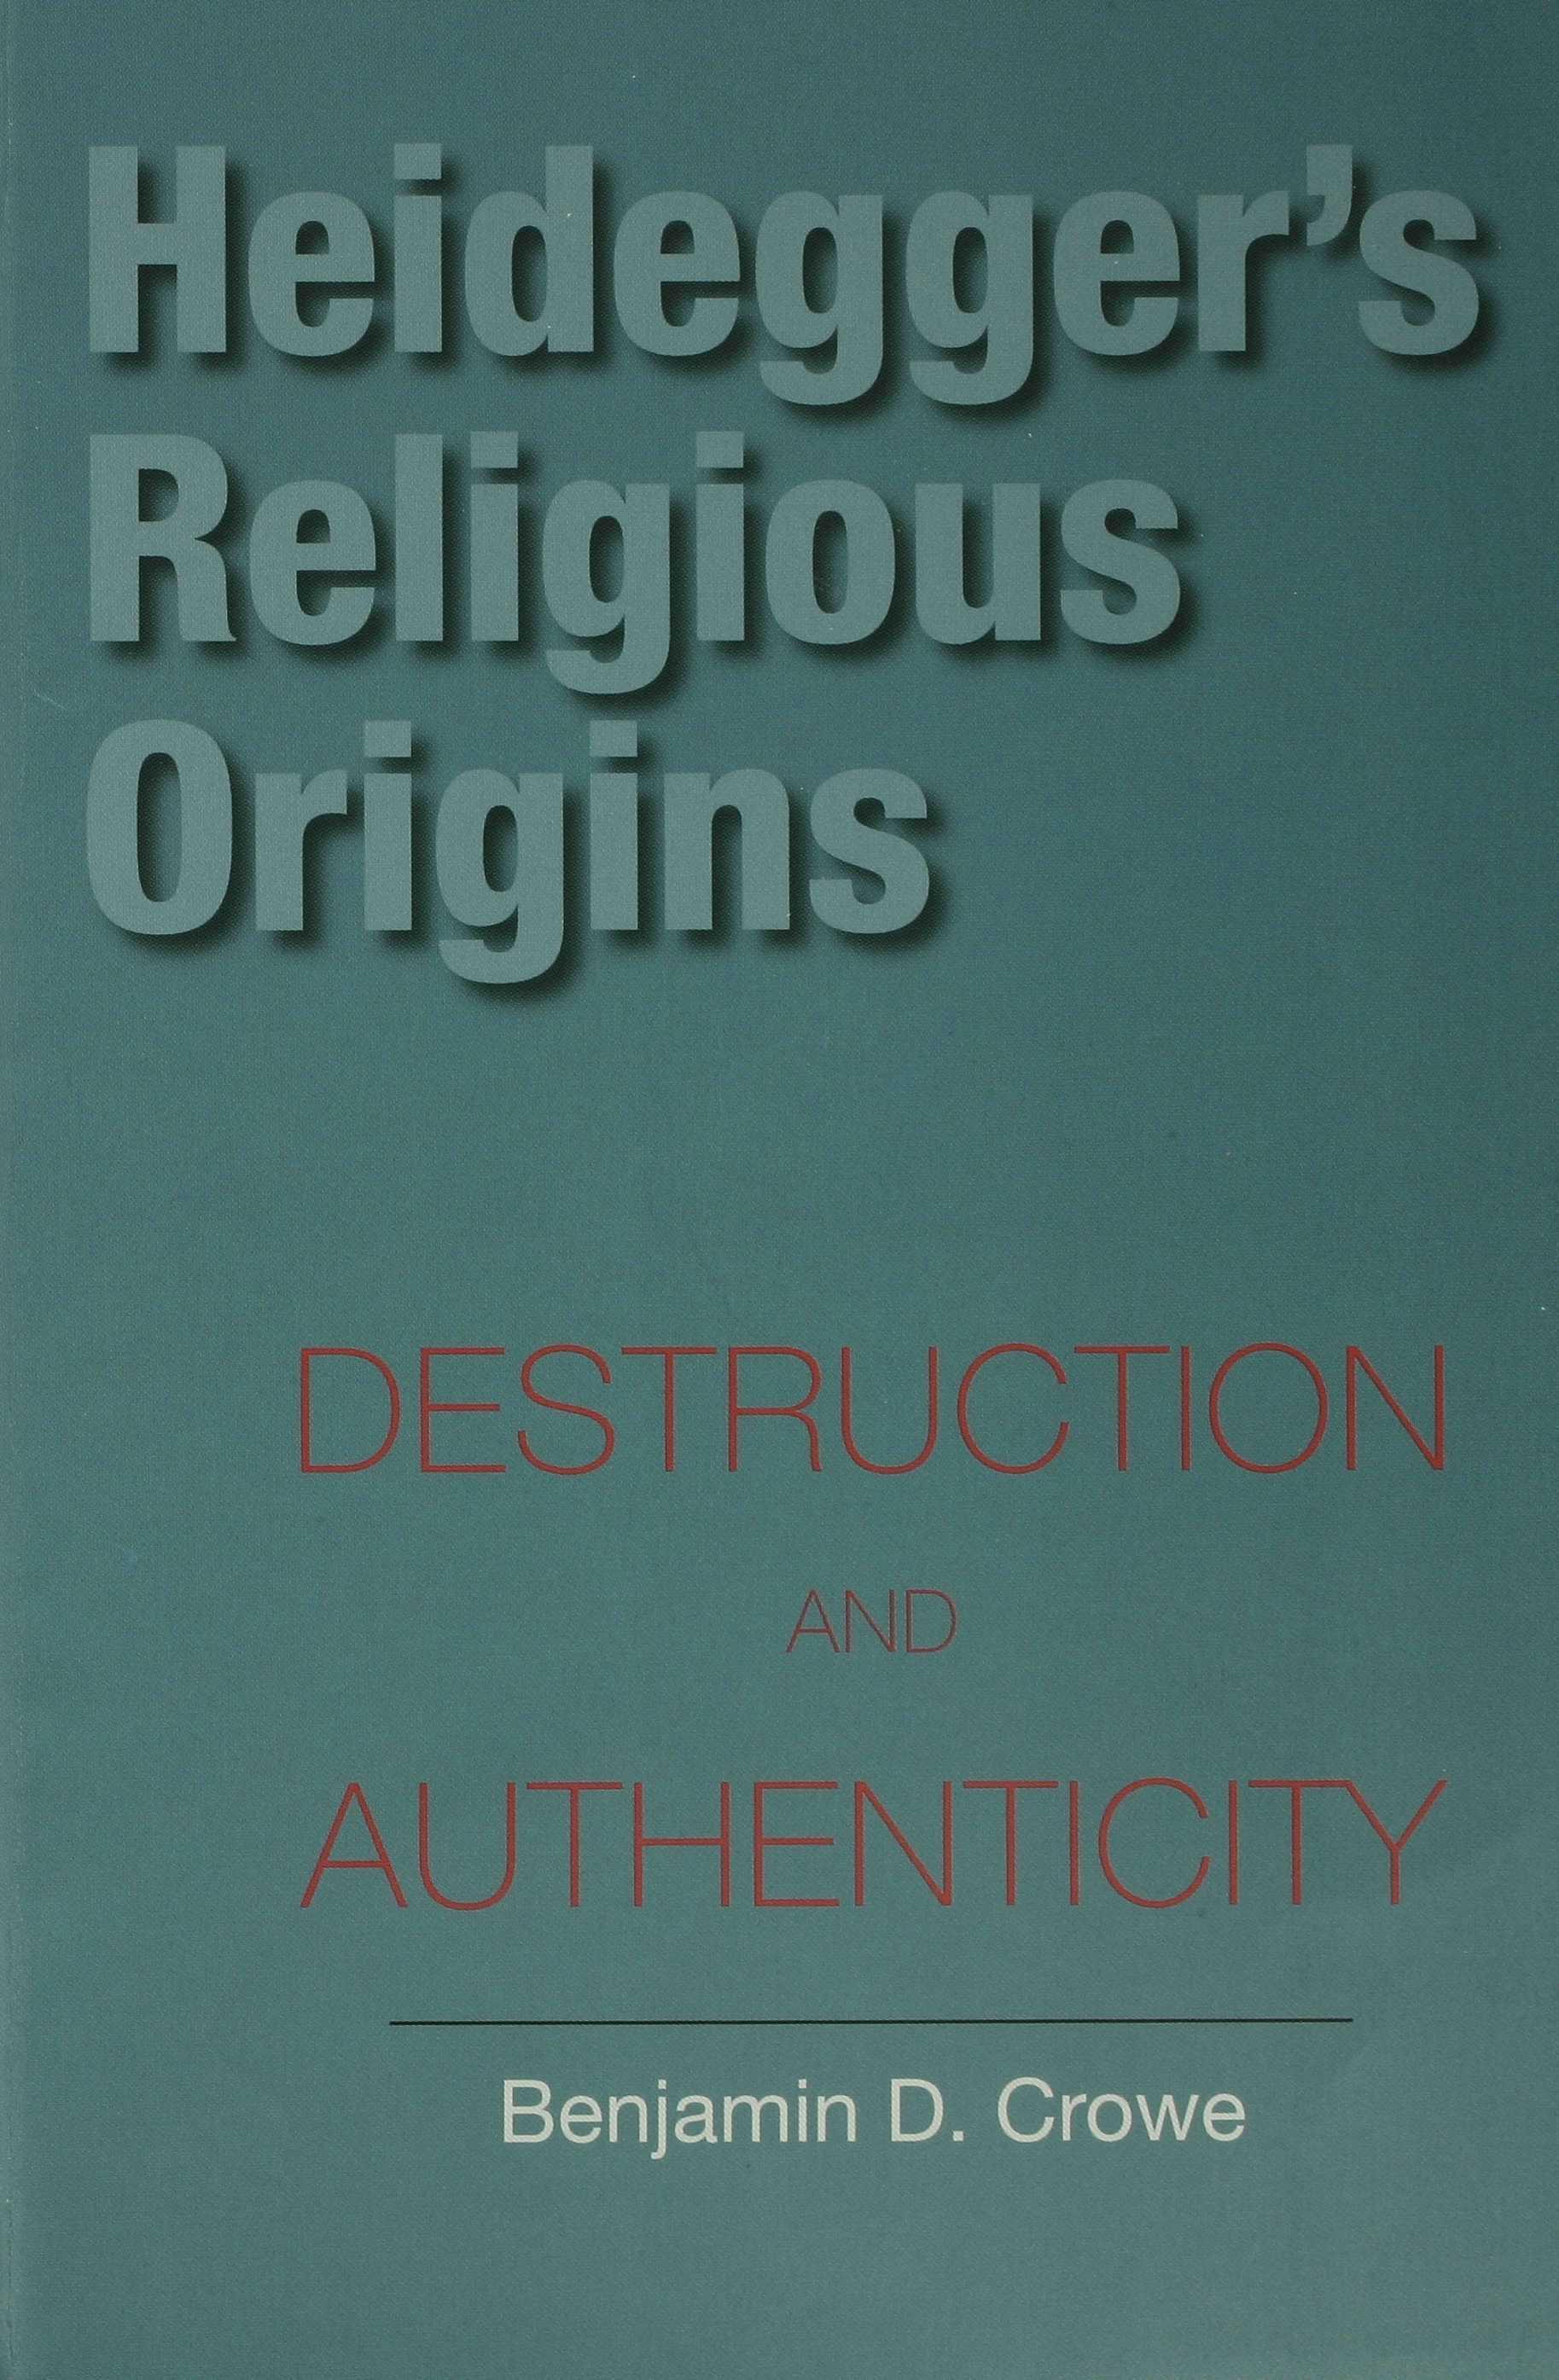 Heidegger's Religious Origins EB9780253111975